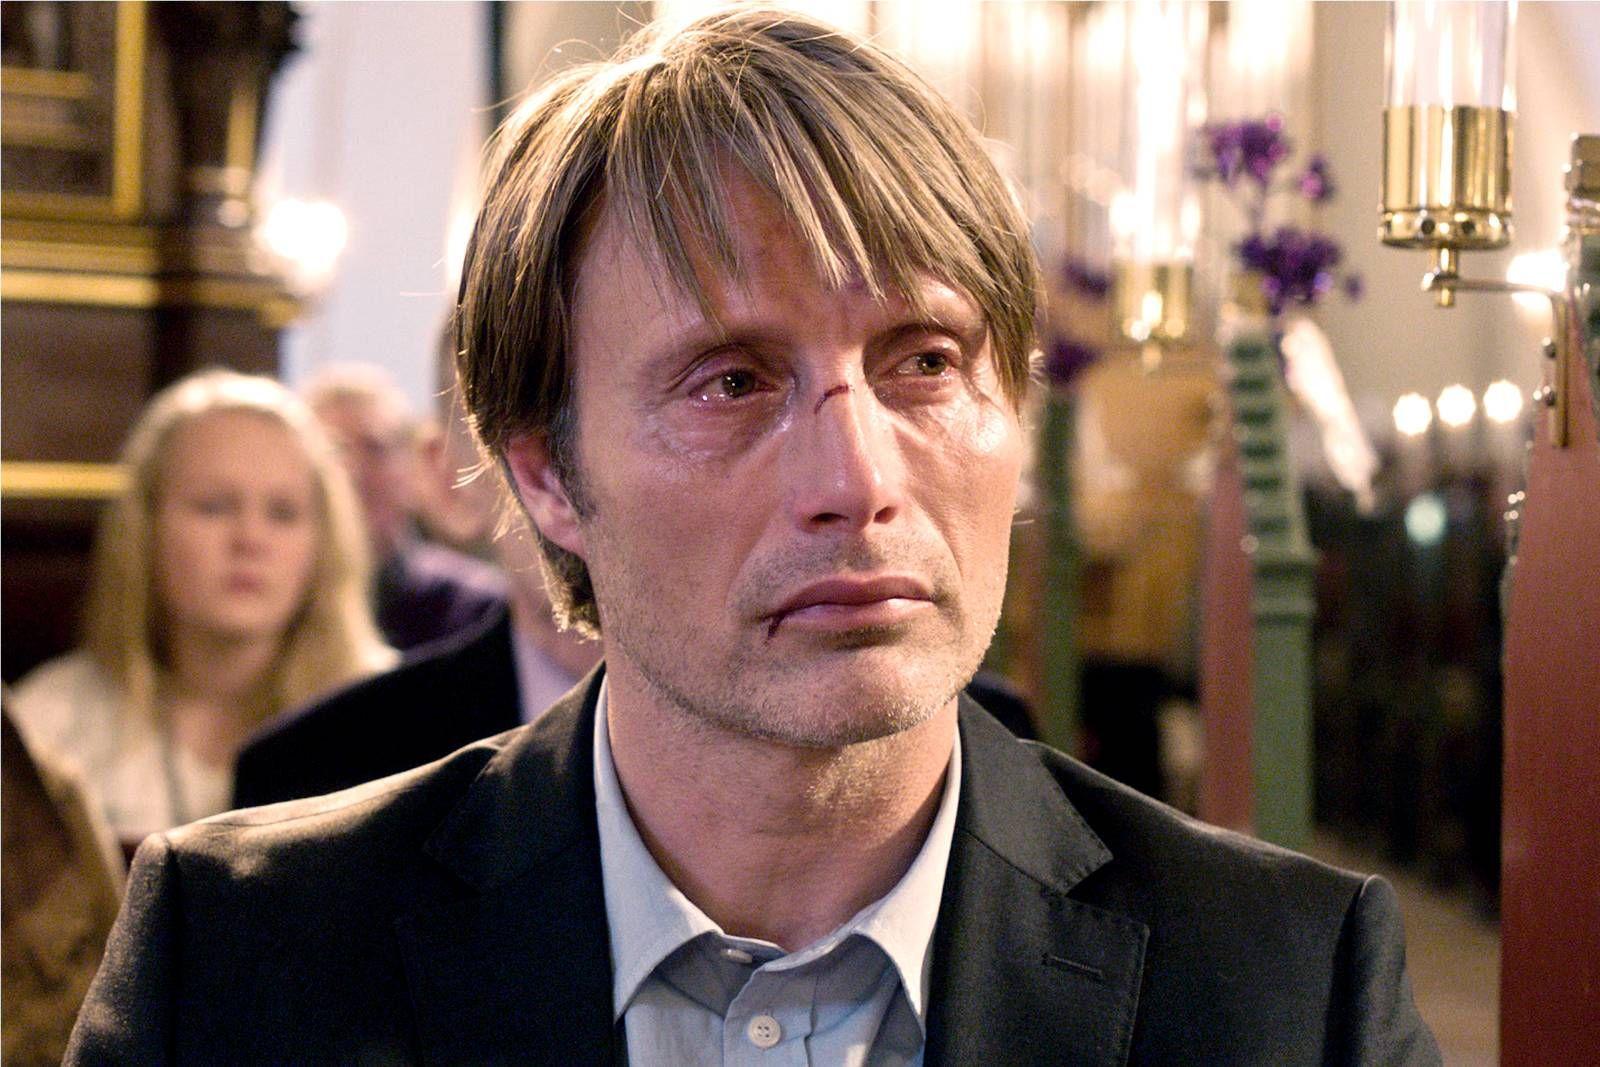 OVERBEVISENDE: Mads Mikkelsens tolkning av rollen som Lucas resulterte i pris for beste mannlige skuespiller på fjorårets filmfestival i Cannes.